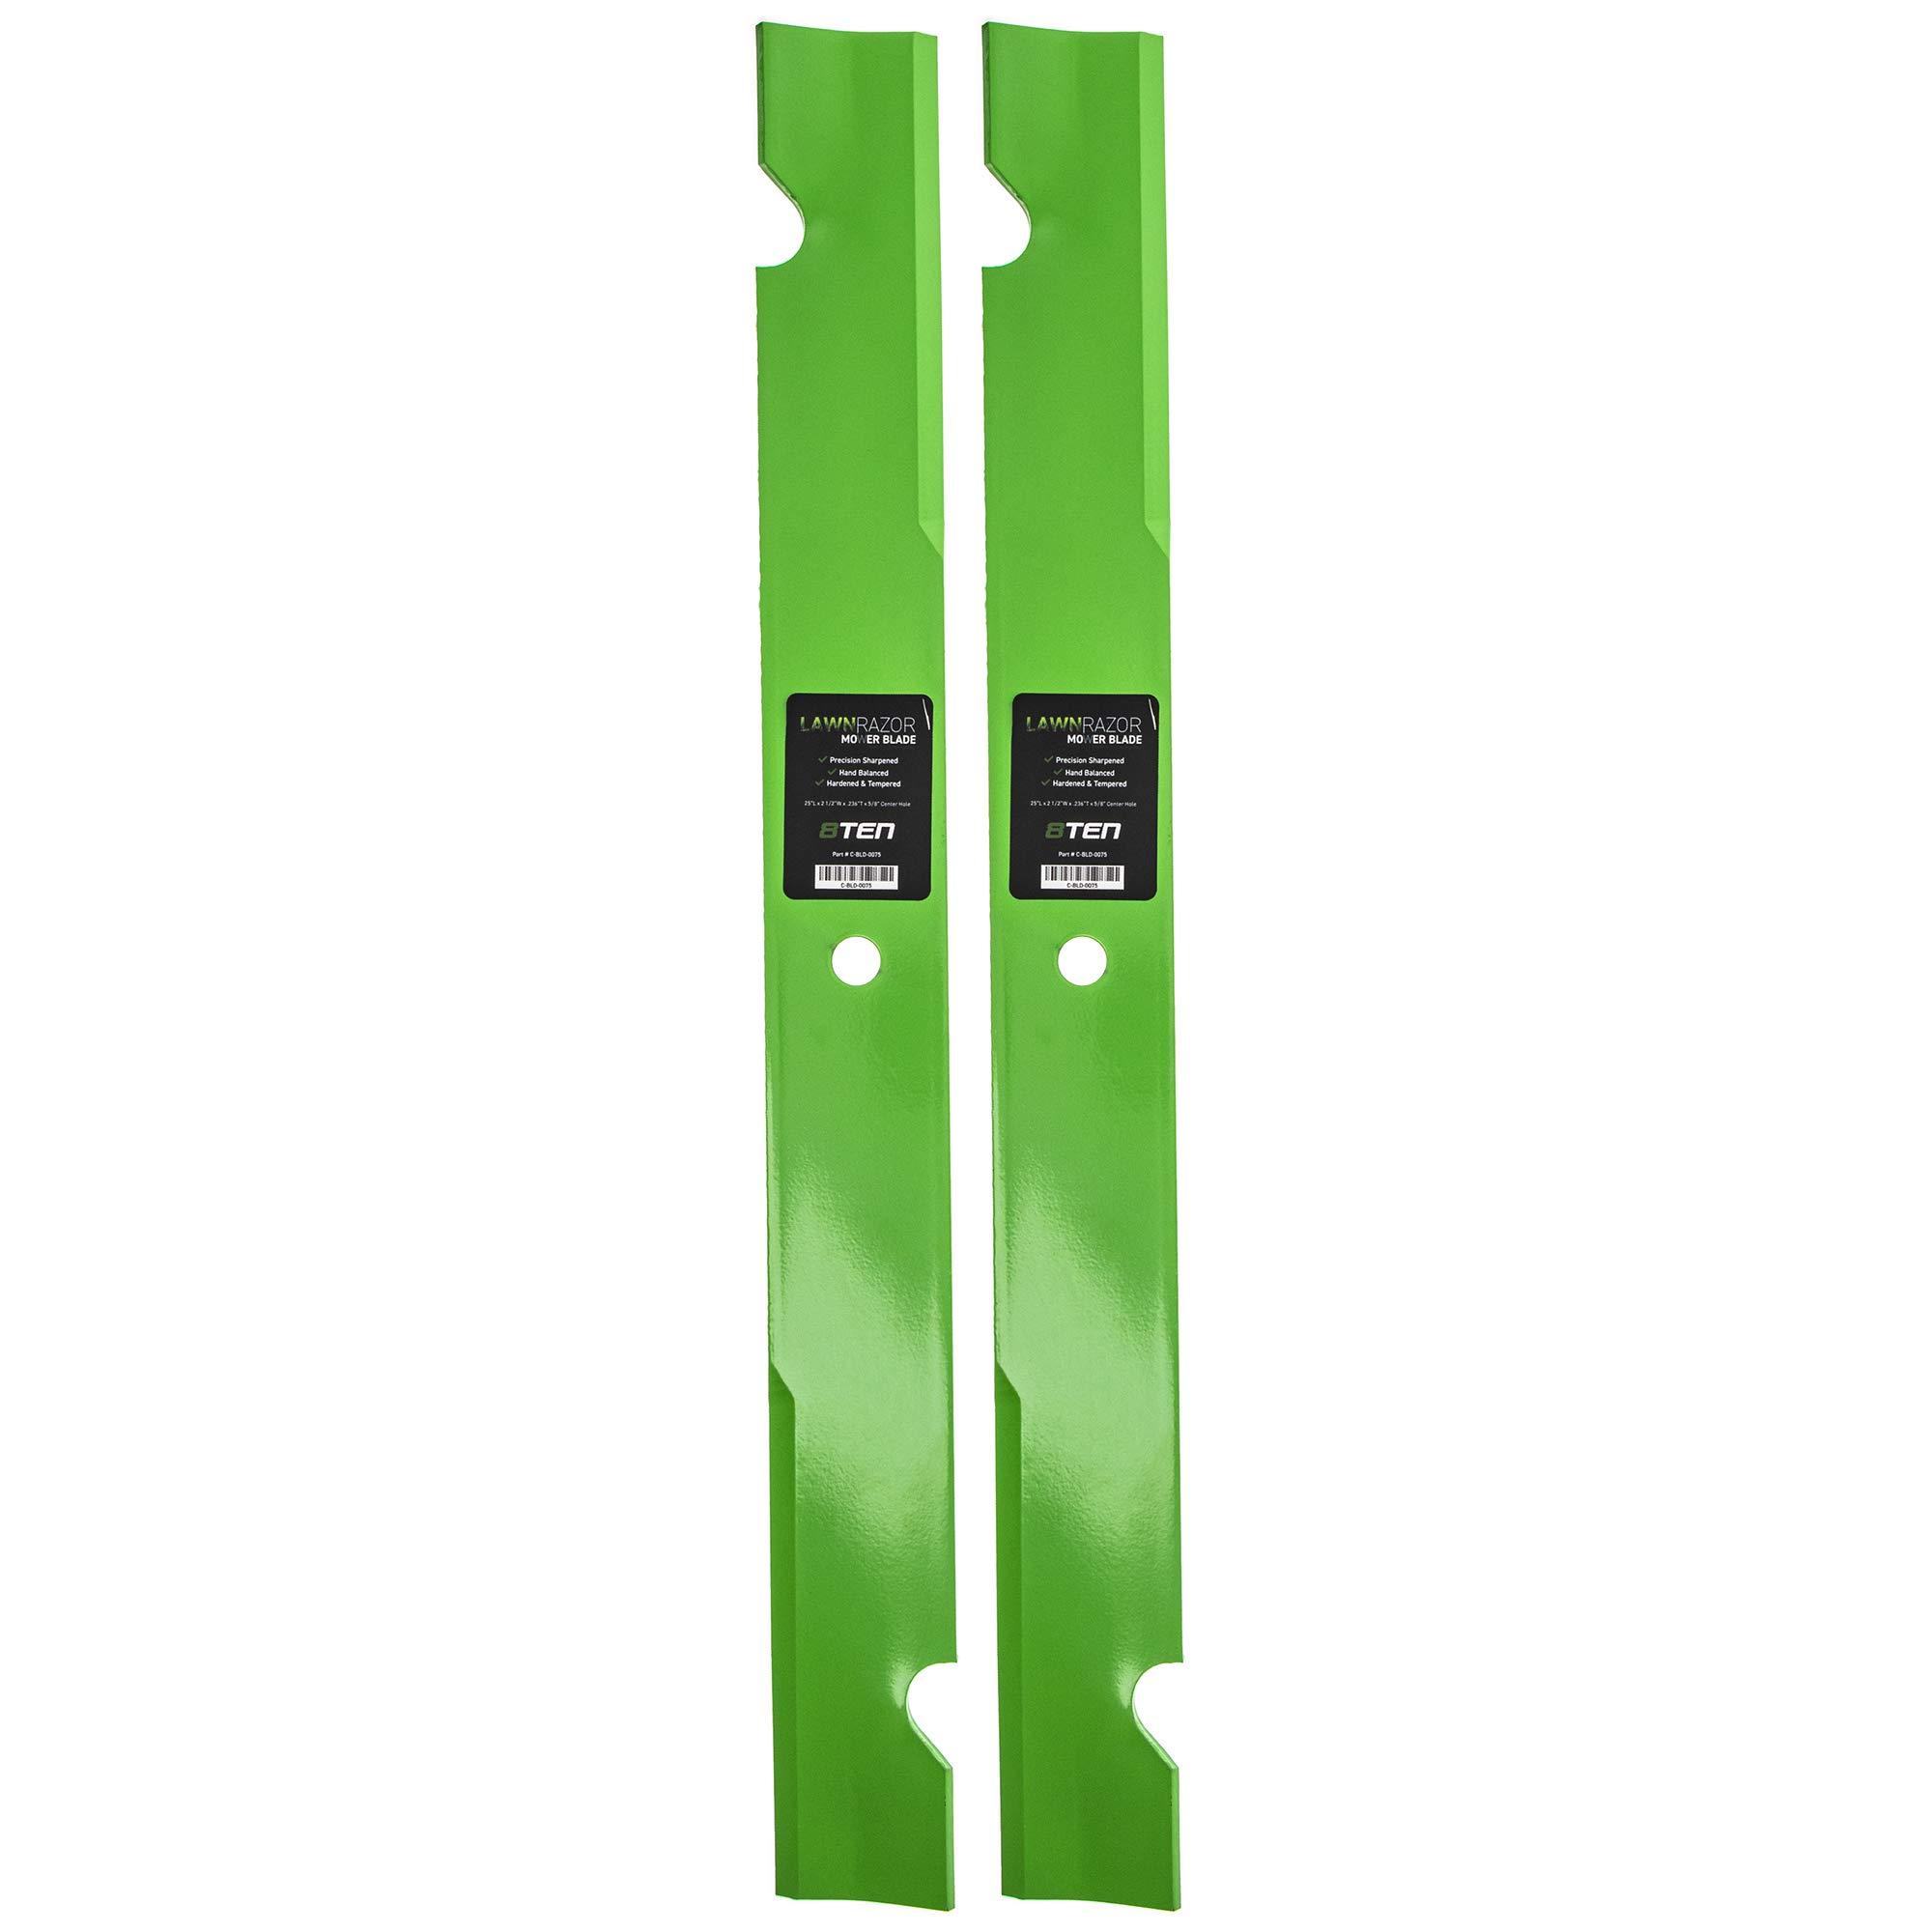 8TEN LawnRAZOR Mower Blade 48 inch Deck for Ferris Bobcat 5102227 574481401 112111-04 2 Pack (Medium Lift)